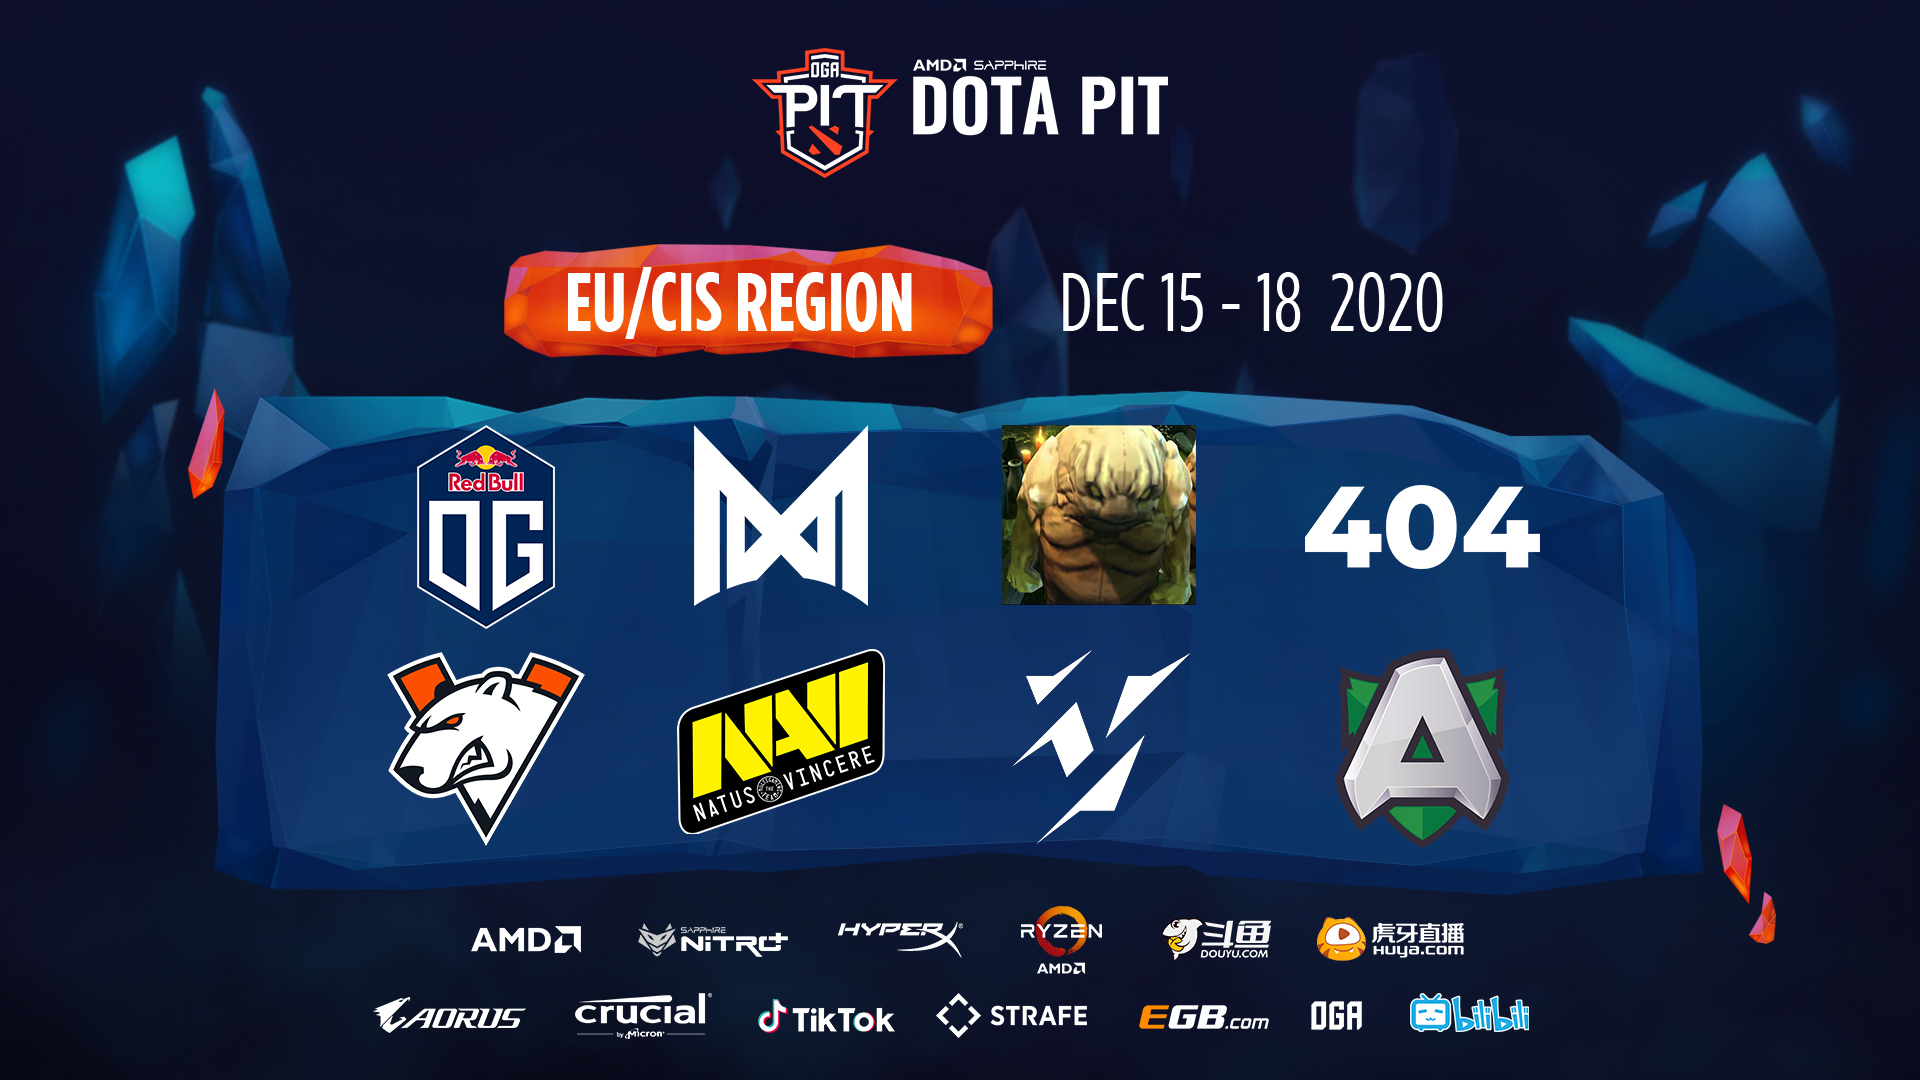 Dota 2 tournament results. OGA Dota PIT Season 4: Europe / CIS